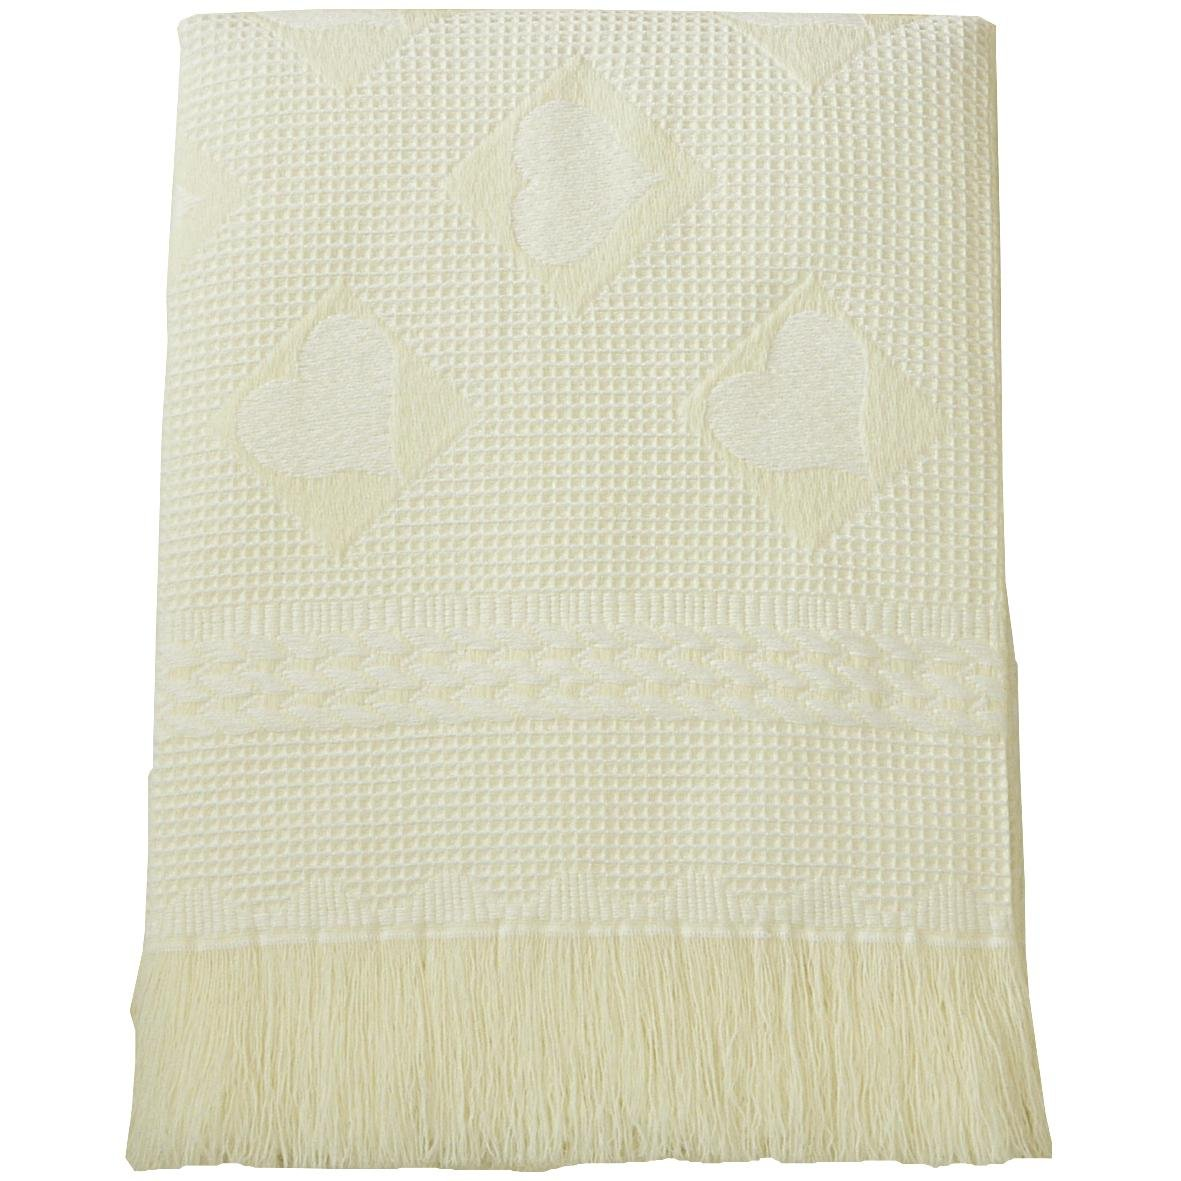 BabyPrem Baby Large Soft White Acrylic Hearts Shawl Blanket 48 x 48 CREAM by BabyPrem   B005OJF8YK